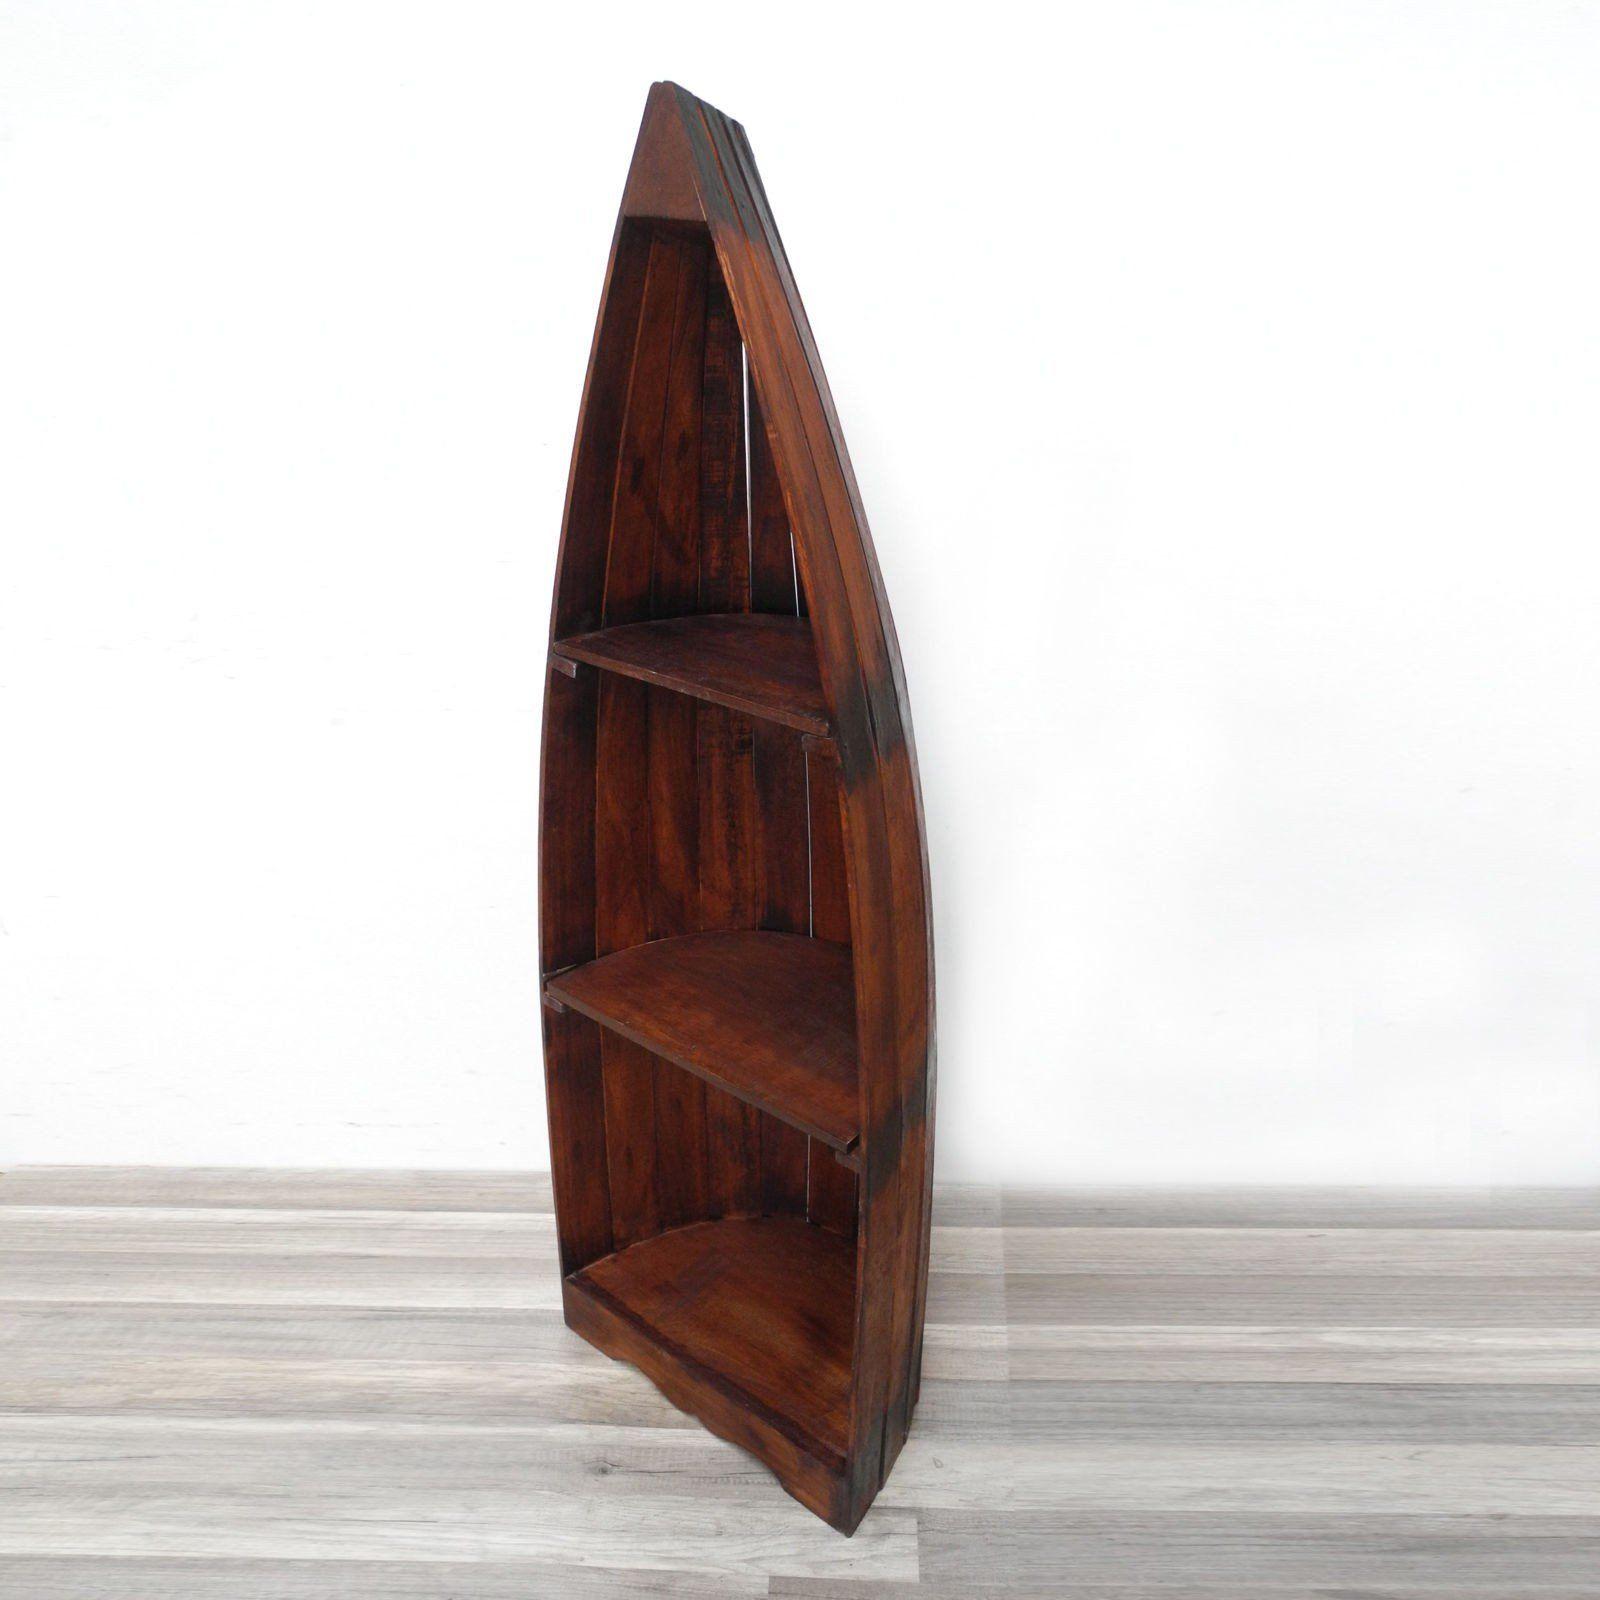 Bootsregal Bücherregal Boot Regal Schiff Schrank 145cm